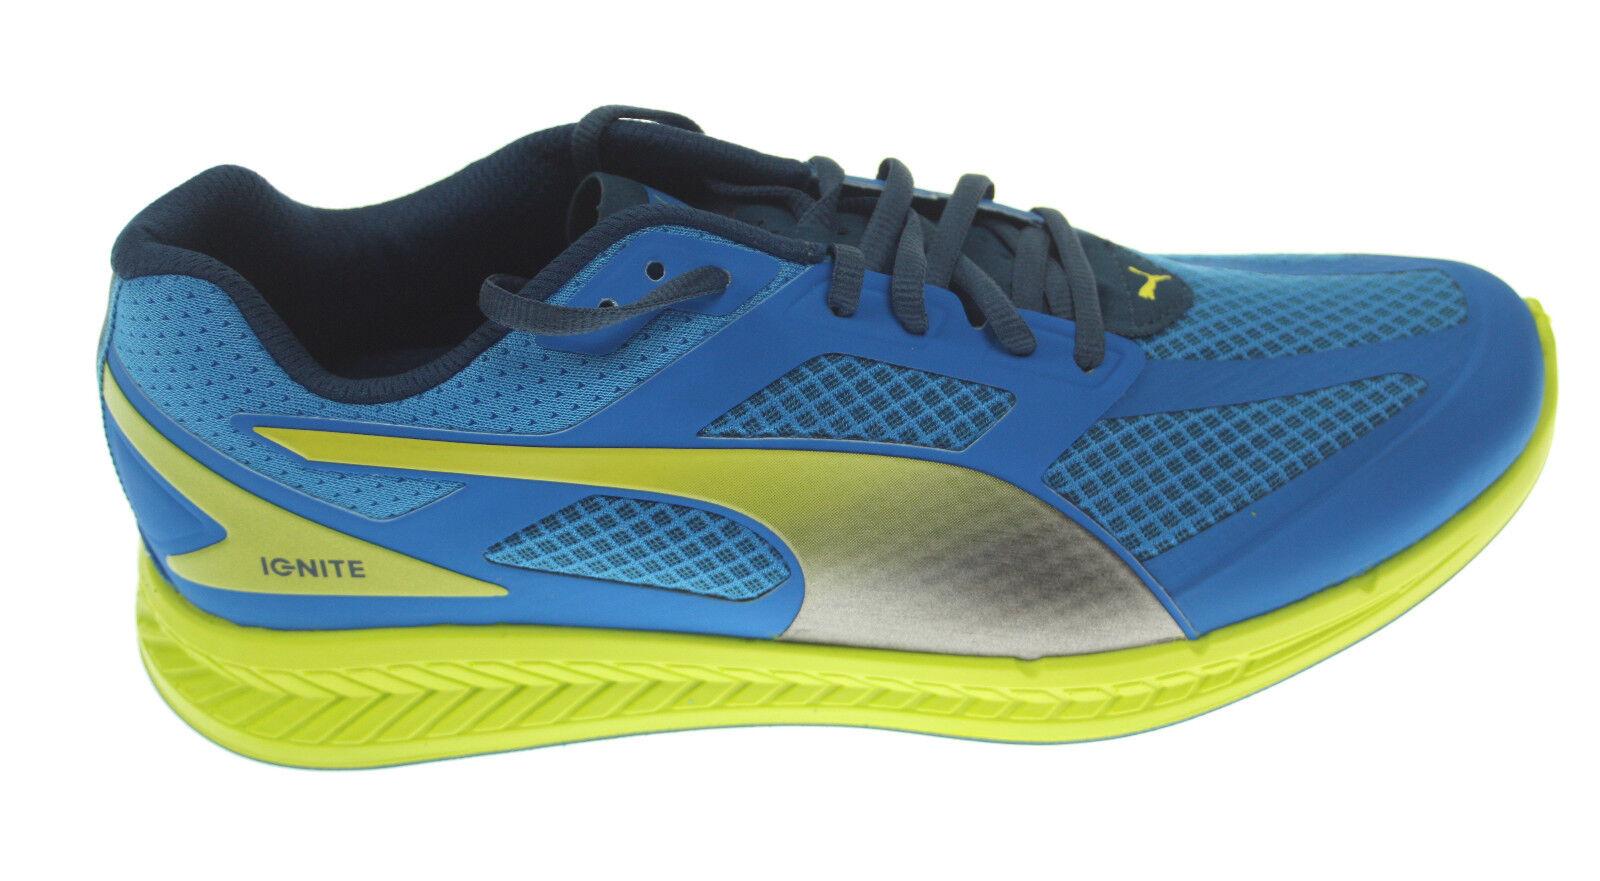 Puma Herren Sneakers, Sportschuhe, Ignite Mesh, Größe 41, 44, UVP  109,95 NEU